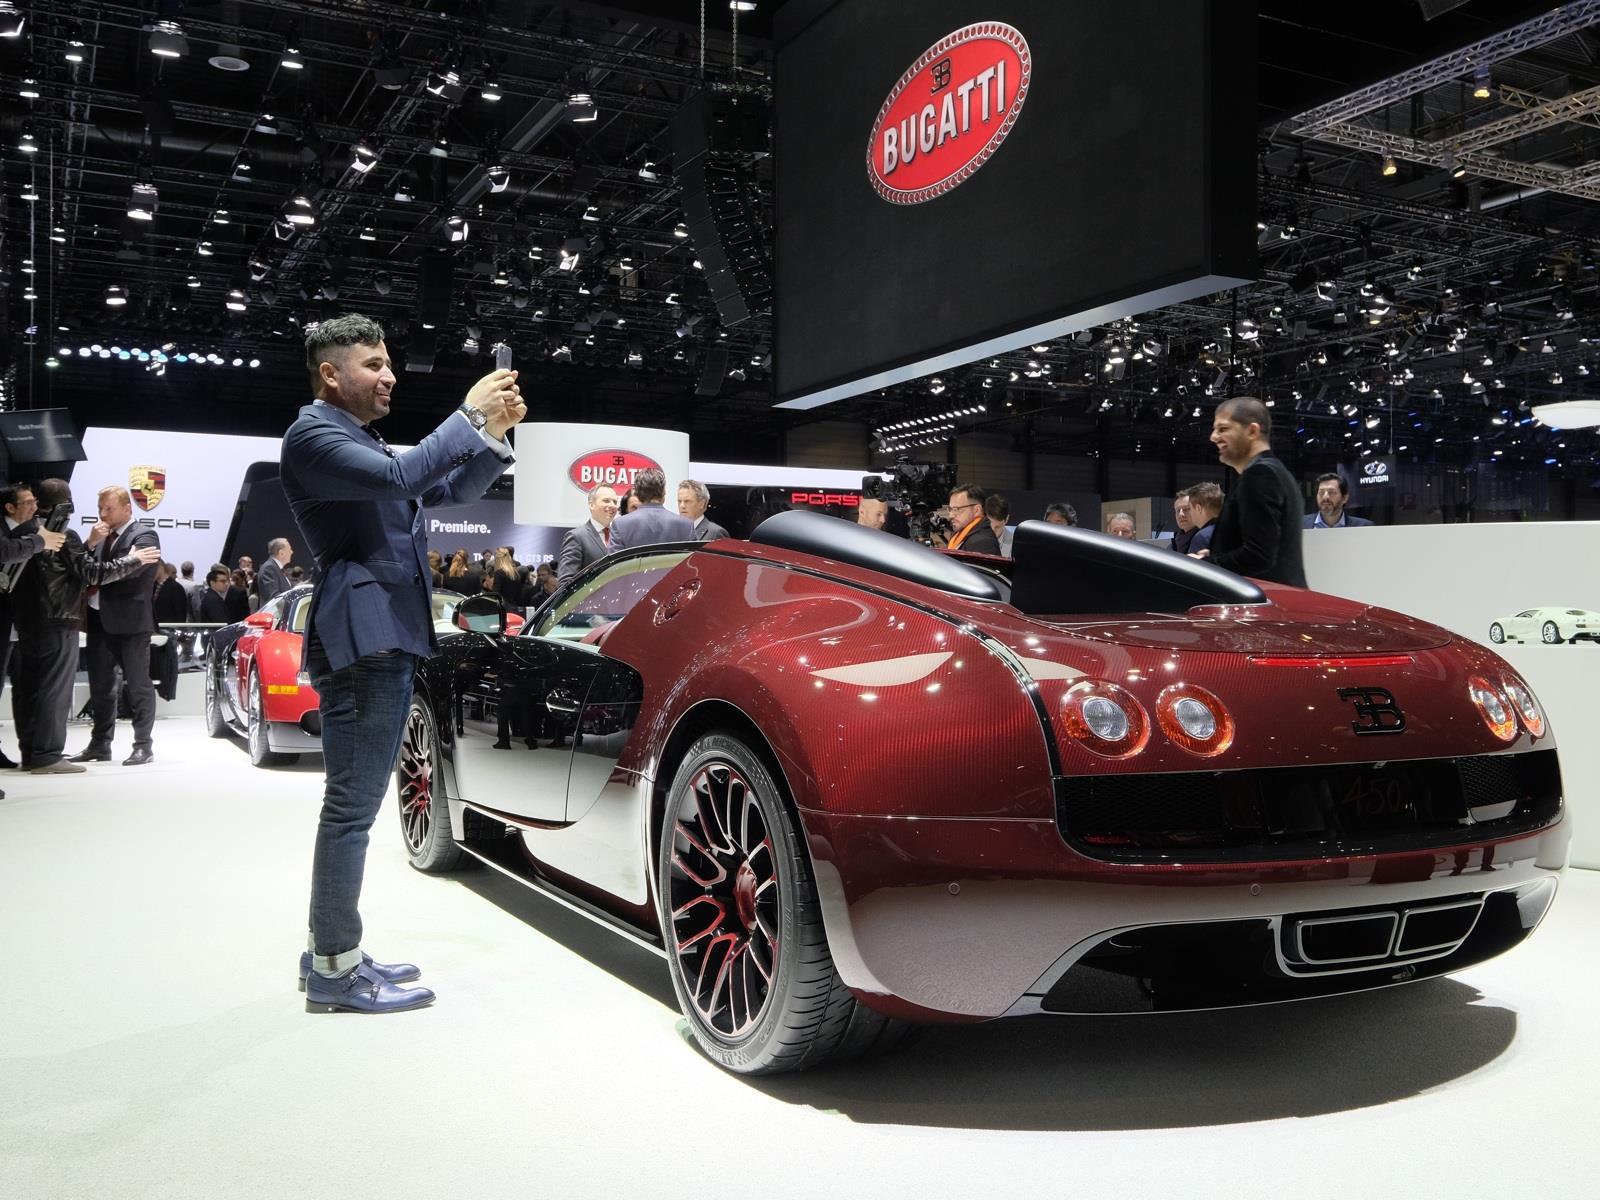 GAZ_e8230e87dcbd4d8f818259e76e3aef93 Remarkable Bugatti Veyron Grand Sport Vitesse Informacion Cars Trend